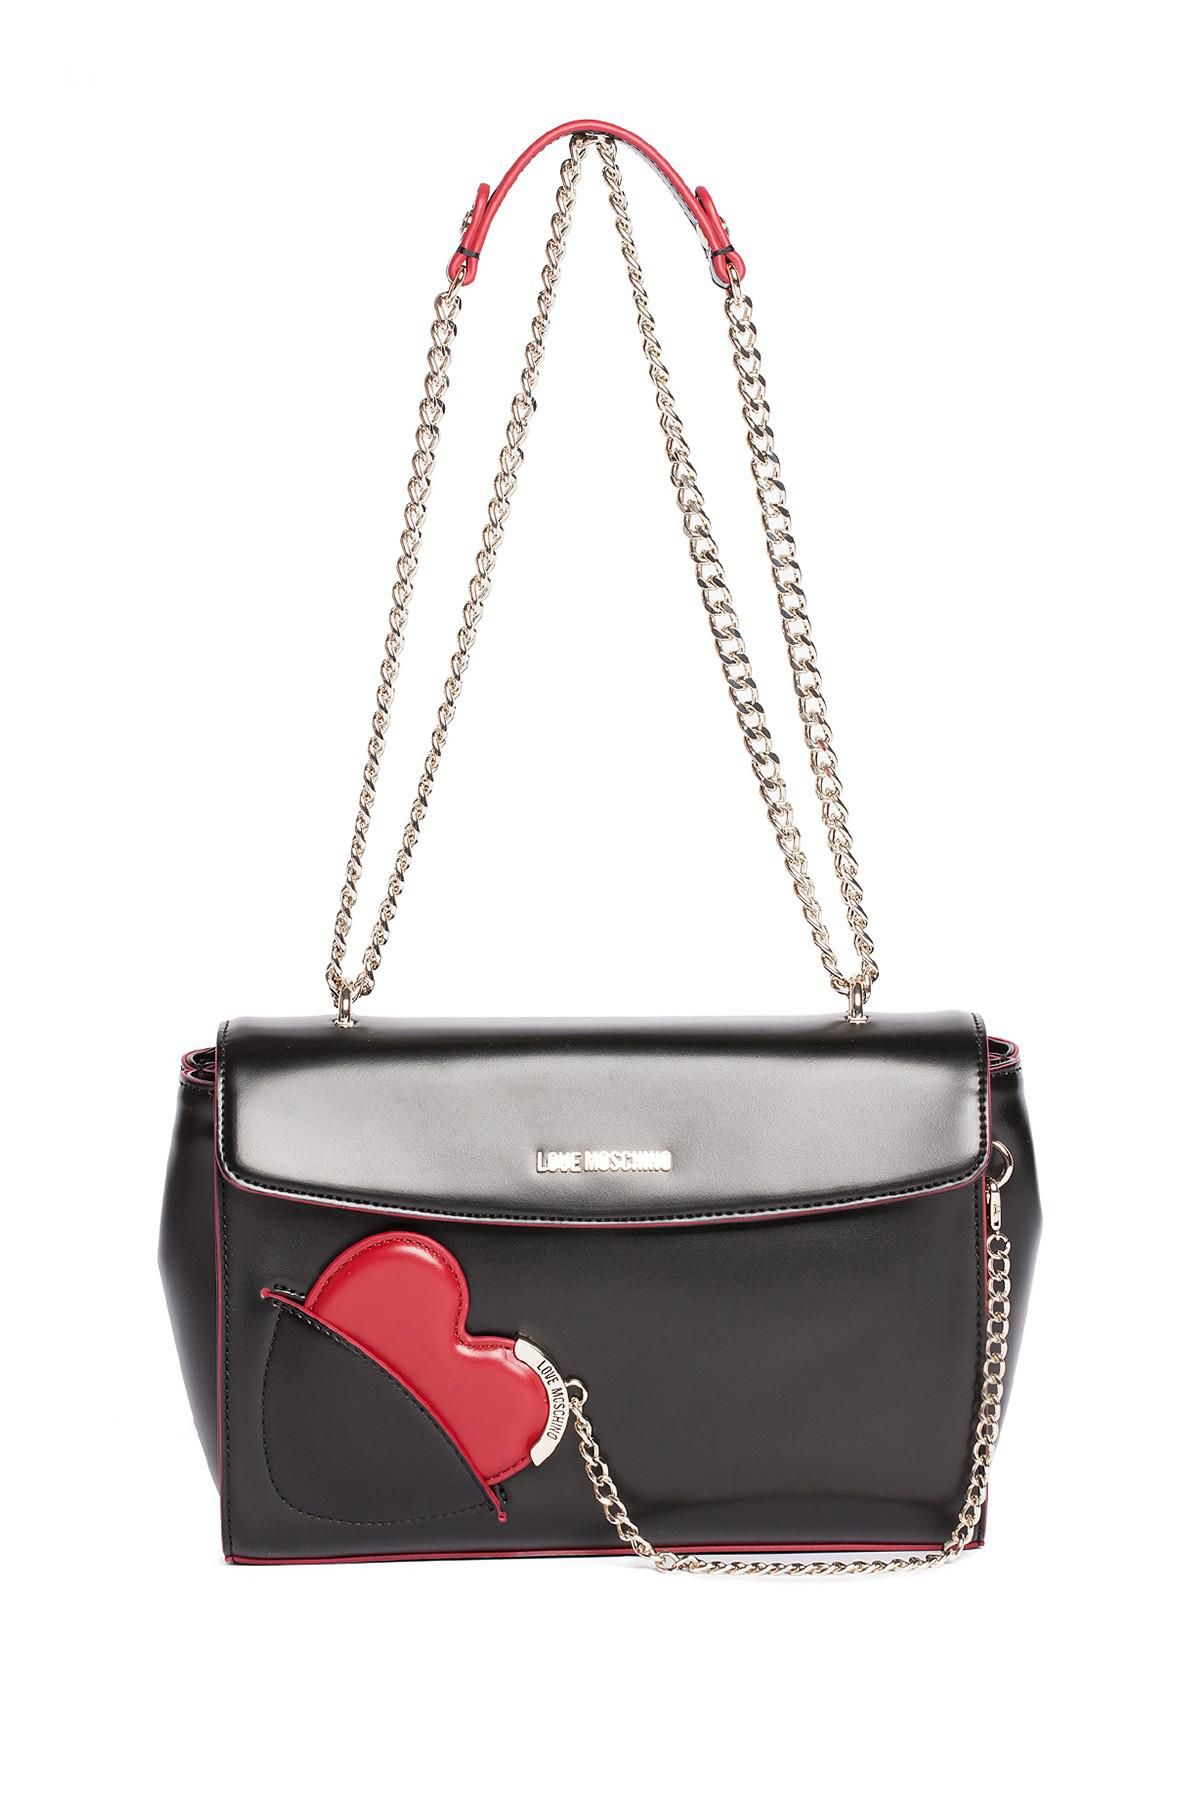 48f465eb57a02 Lyst - Love Moschino Heart Mirror Chain Drop Shoulder Bag in Black